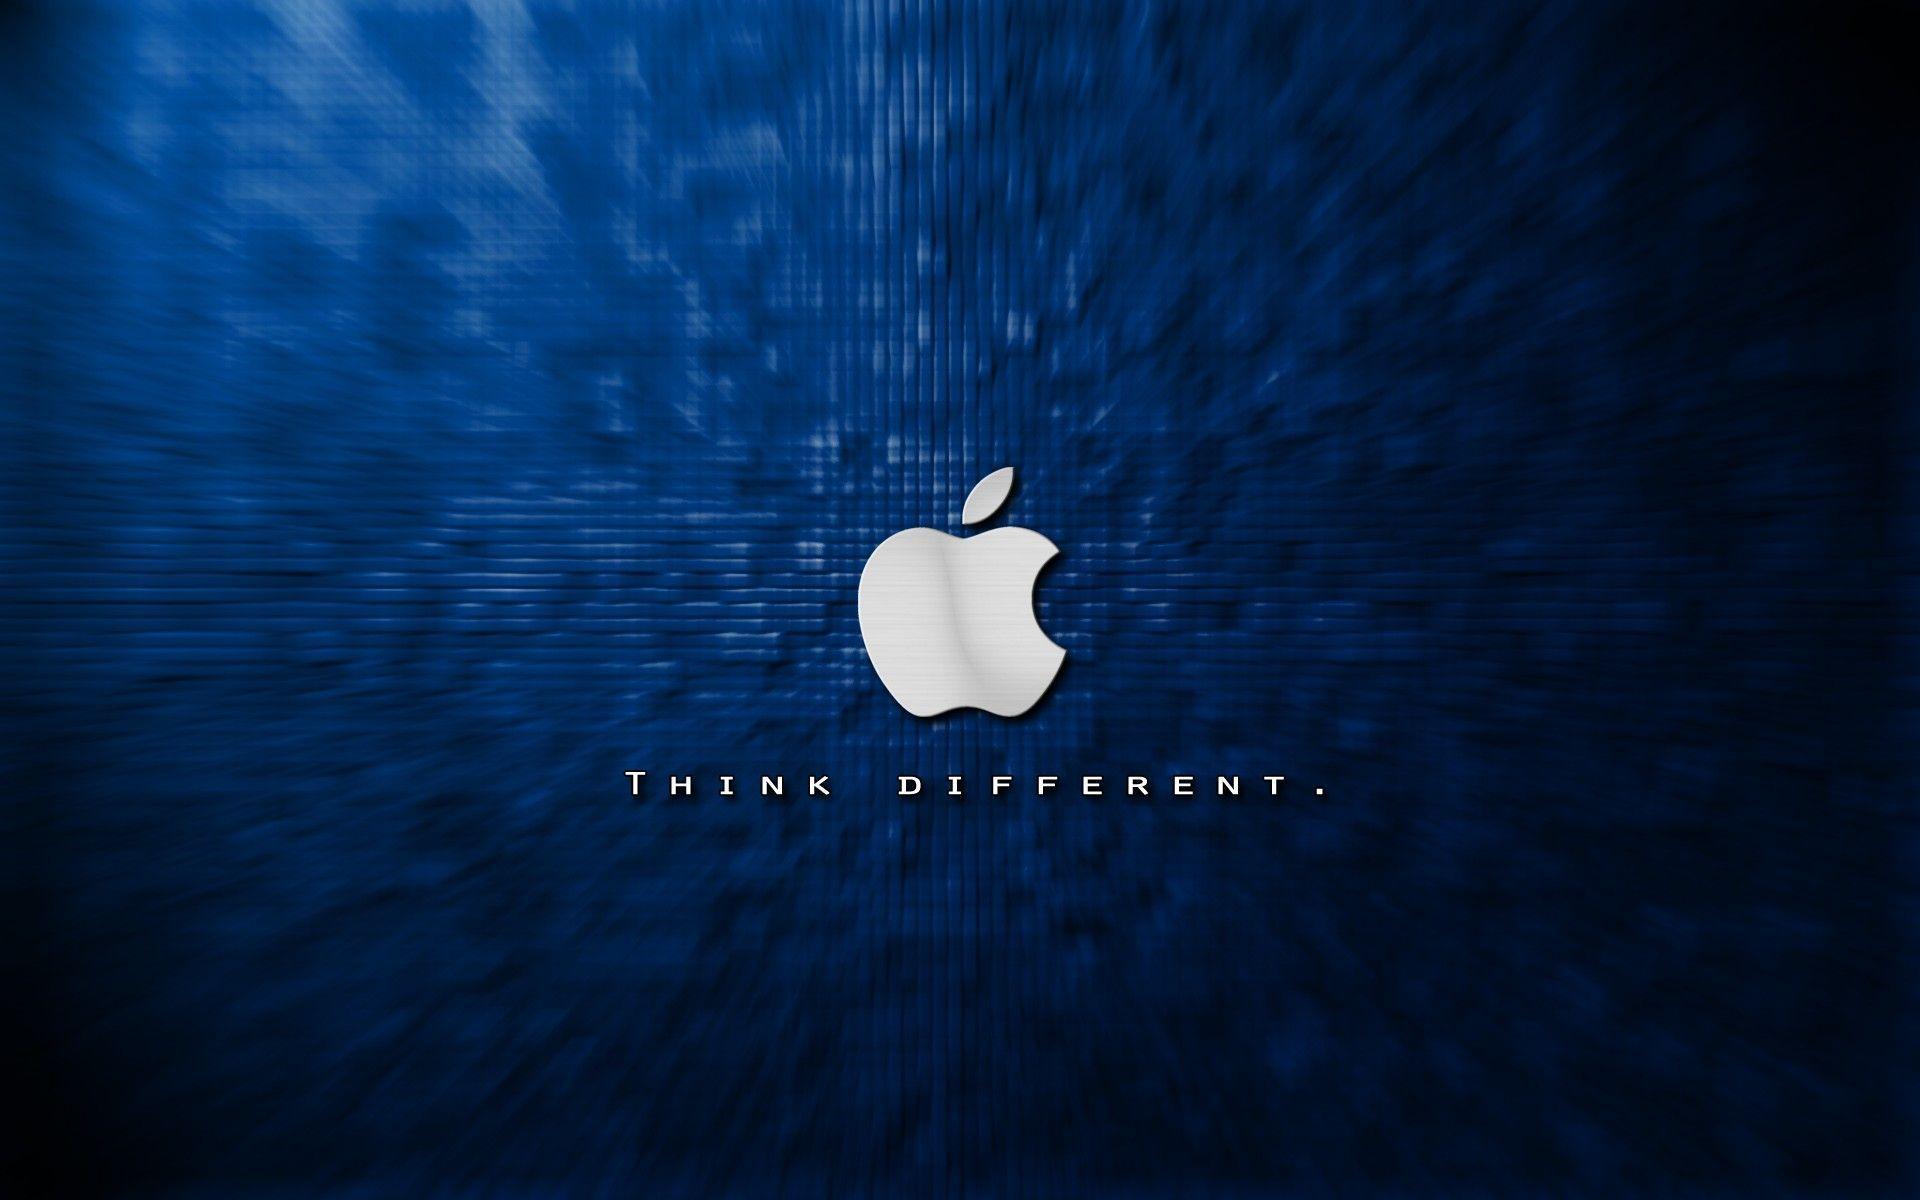 Hd Apple Wallpaper Images   Ultra Hd Ipad Pro Wallpaper 4k 1920x1200